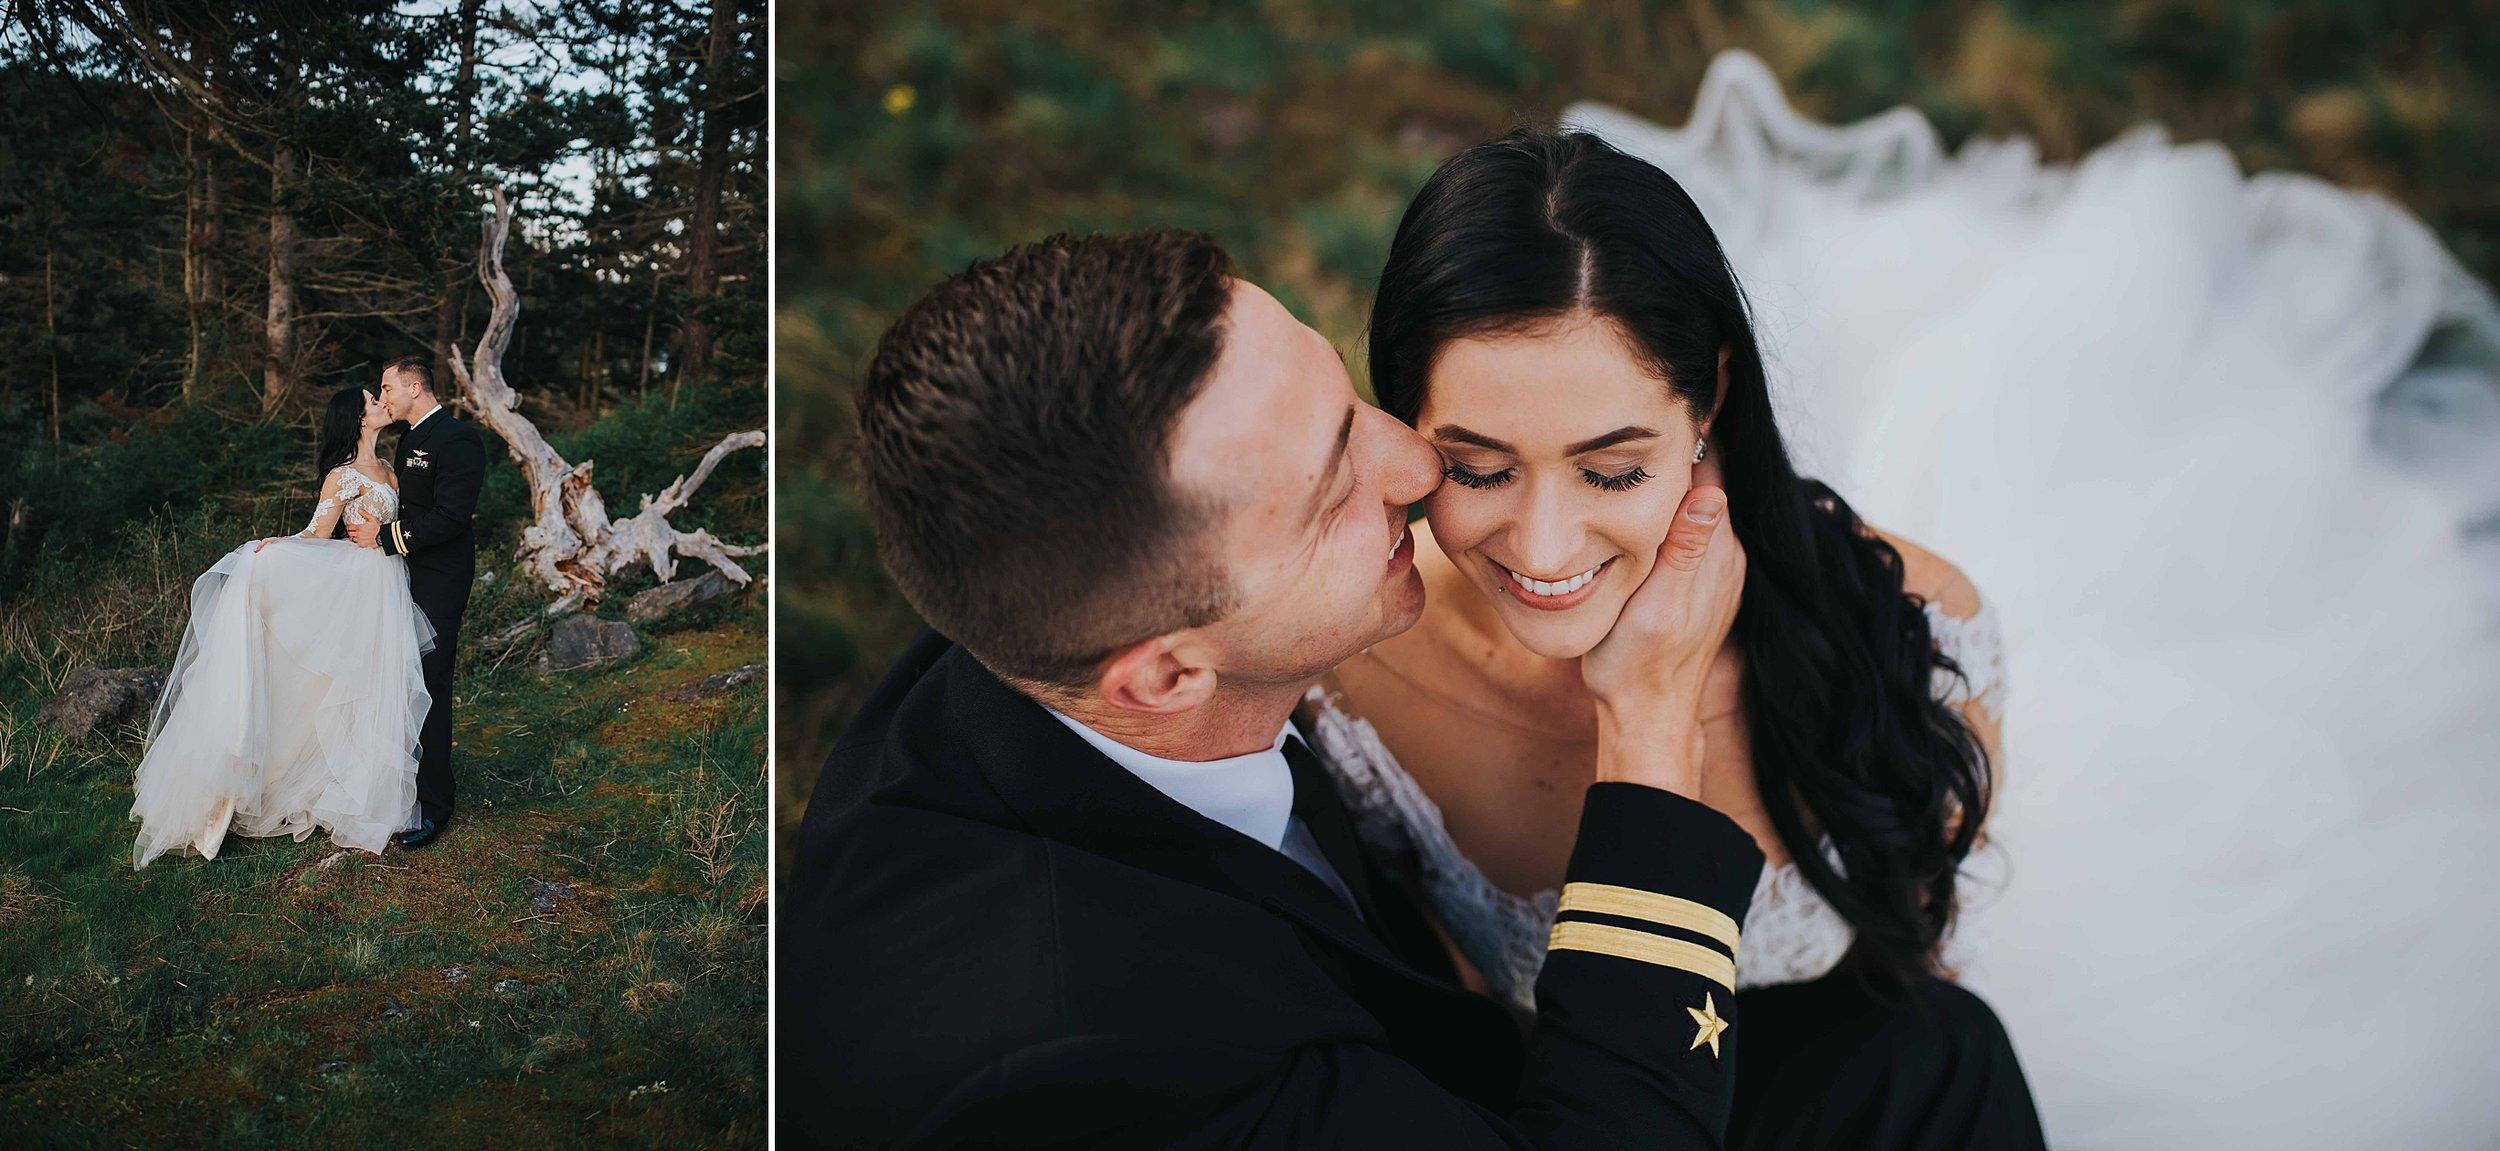 KC-Wedding-photographer-J HODGES PHOTOGRAPHY_0263.jpg